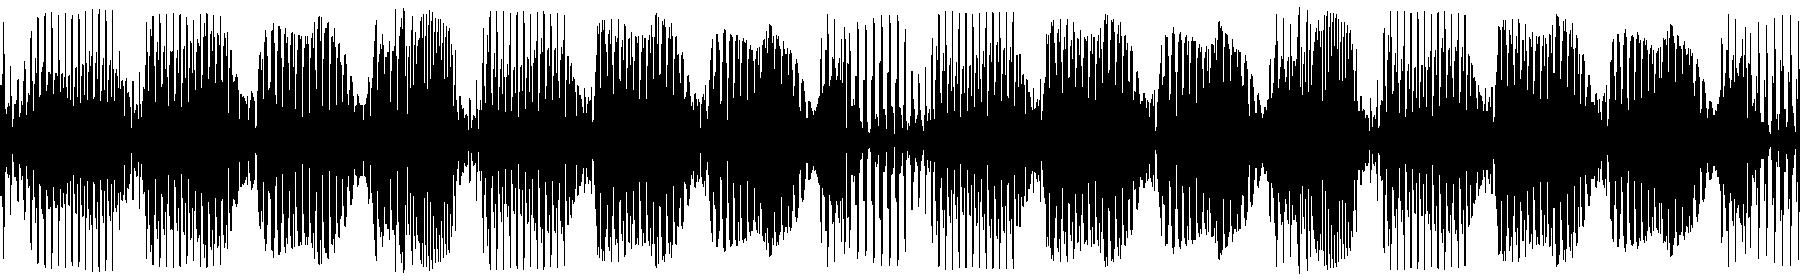 wide sound bass